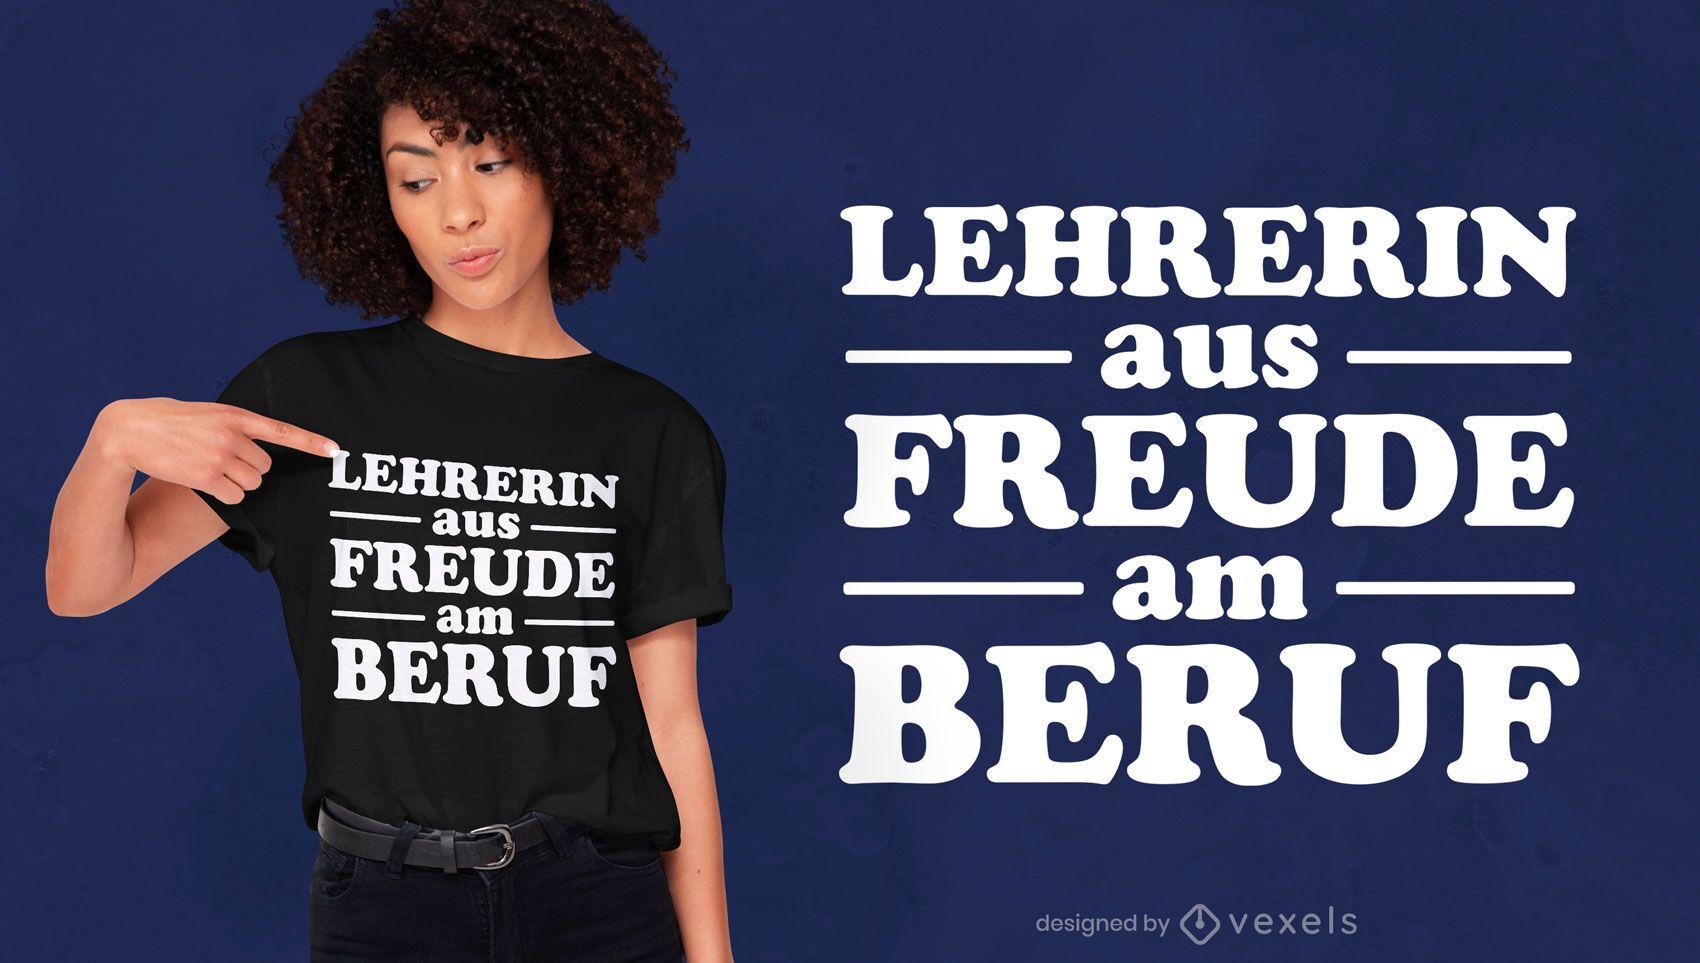 Teacher German quote t-shirt design